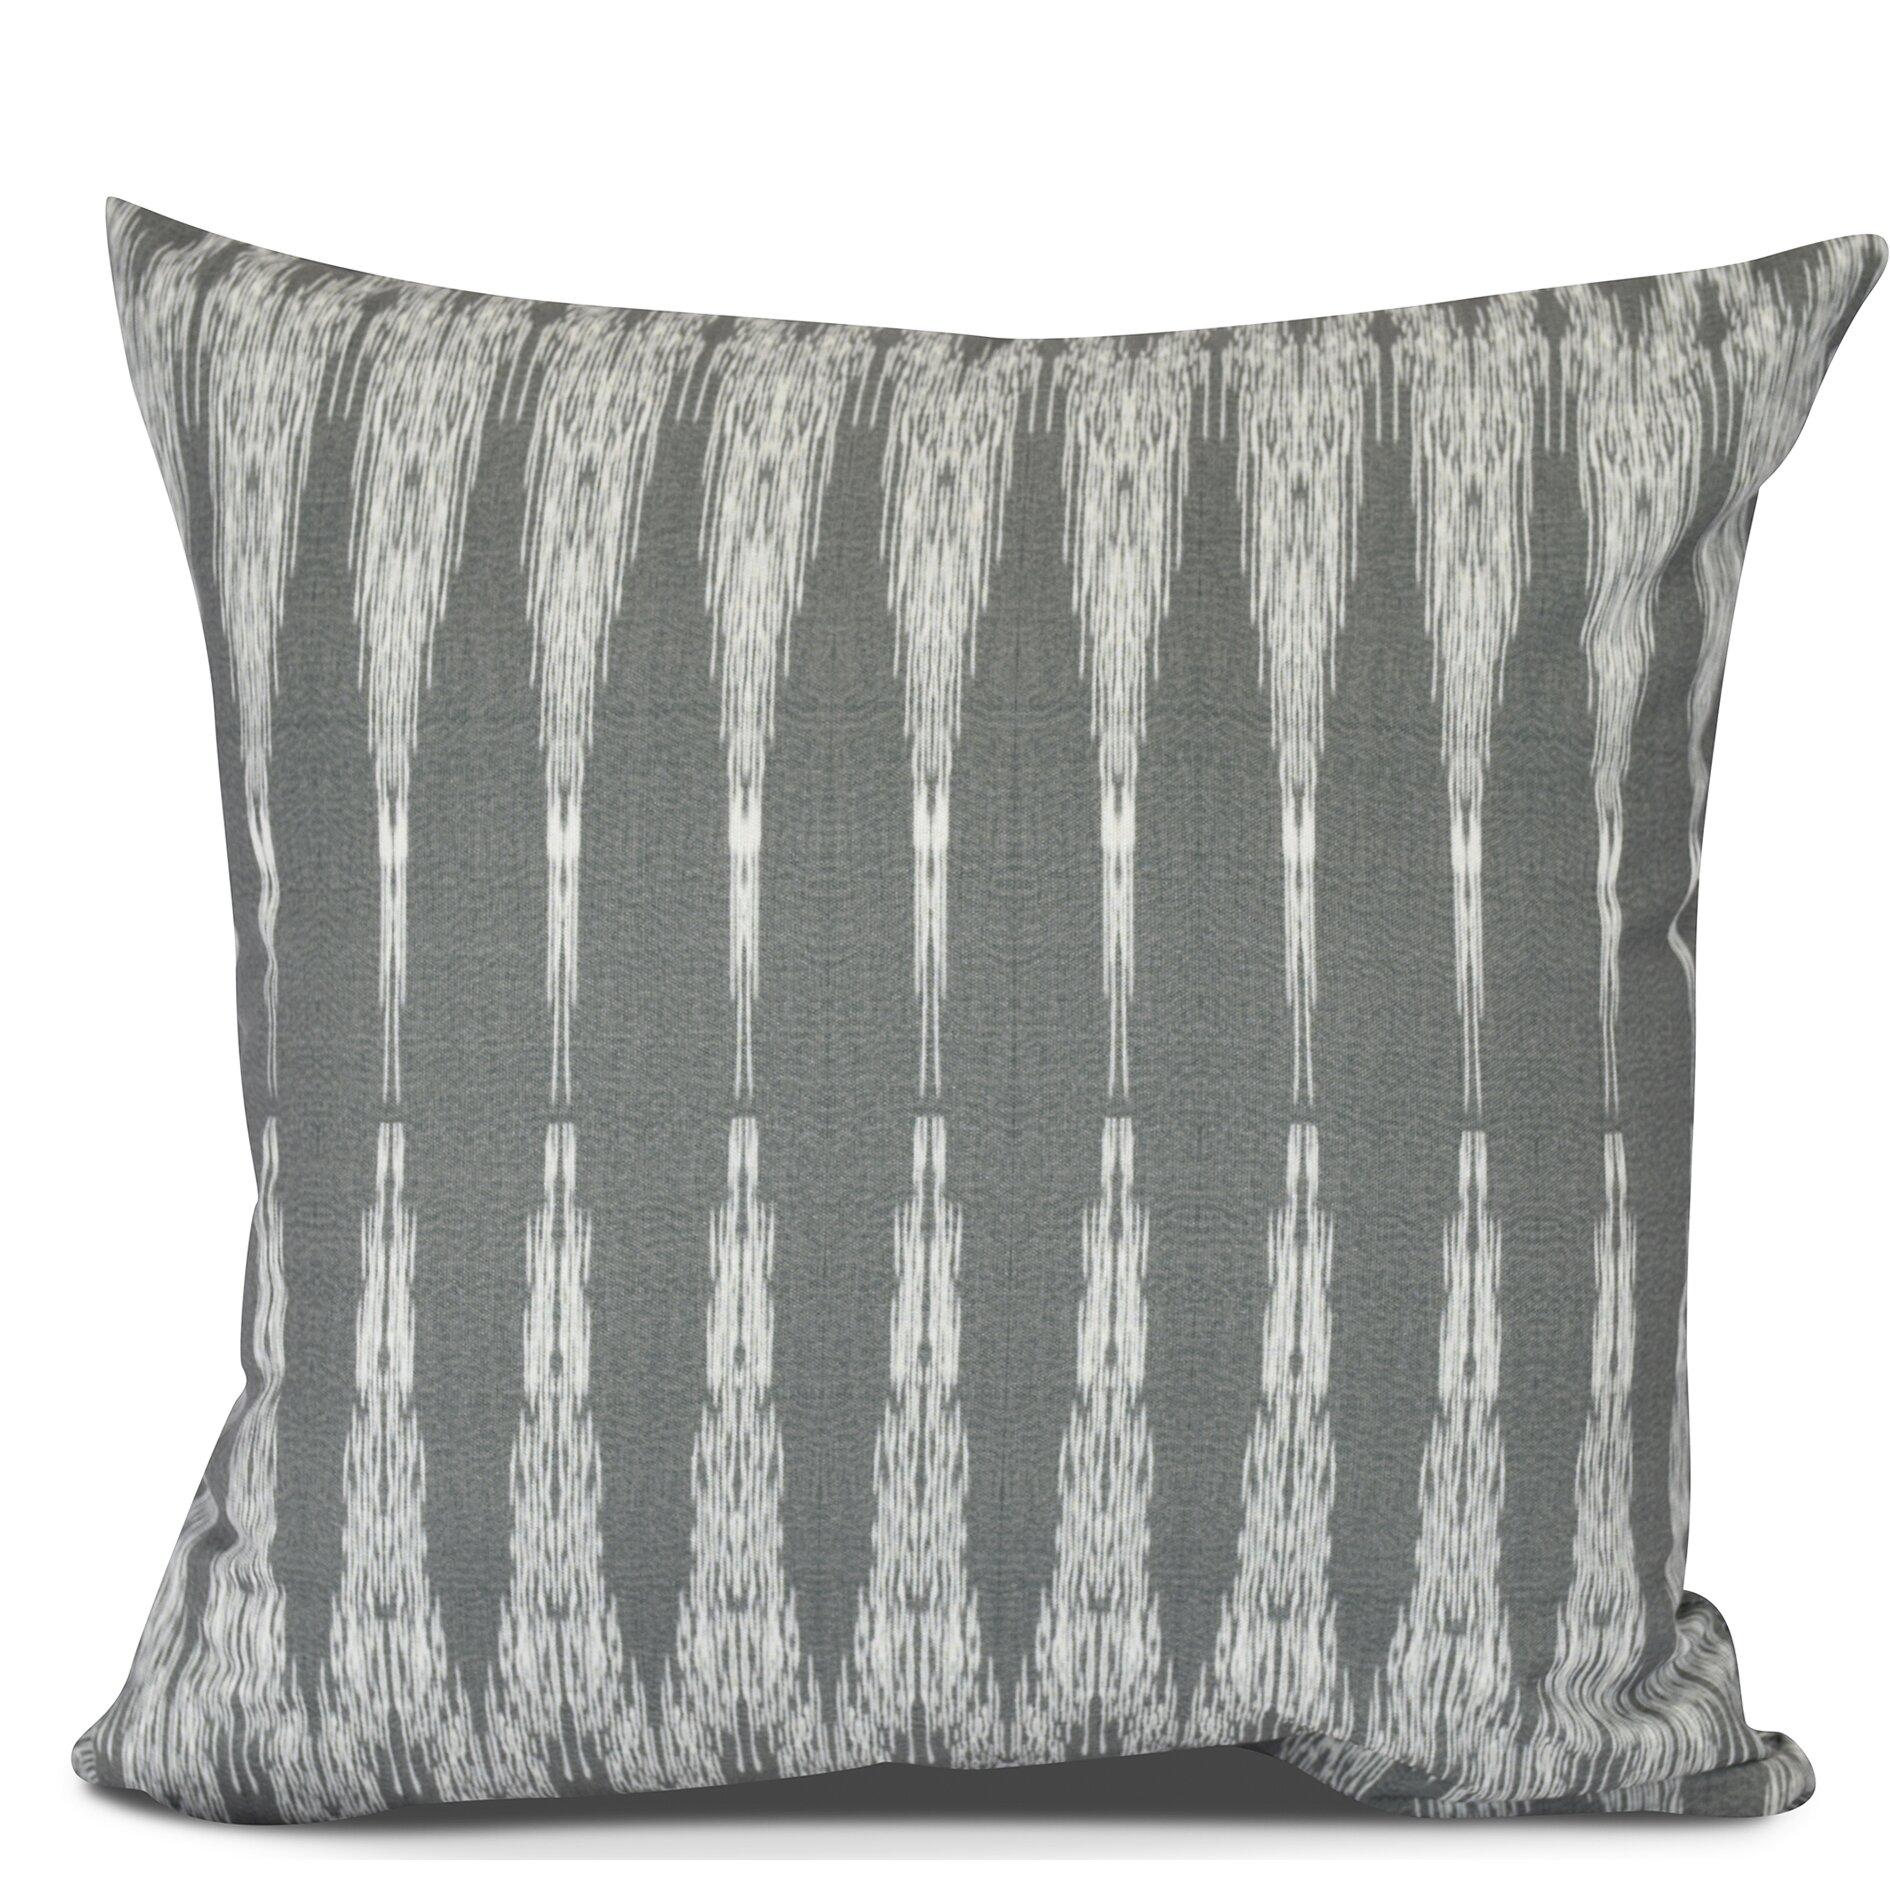 bungalow rose™ molly peace  geometric throw pillow  wayfair - bungalow rosetrade molly peace  geometric throw pillow